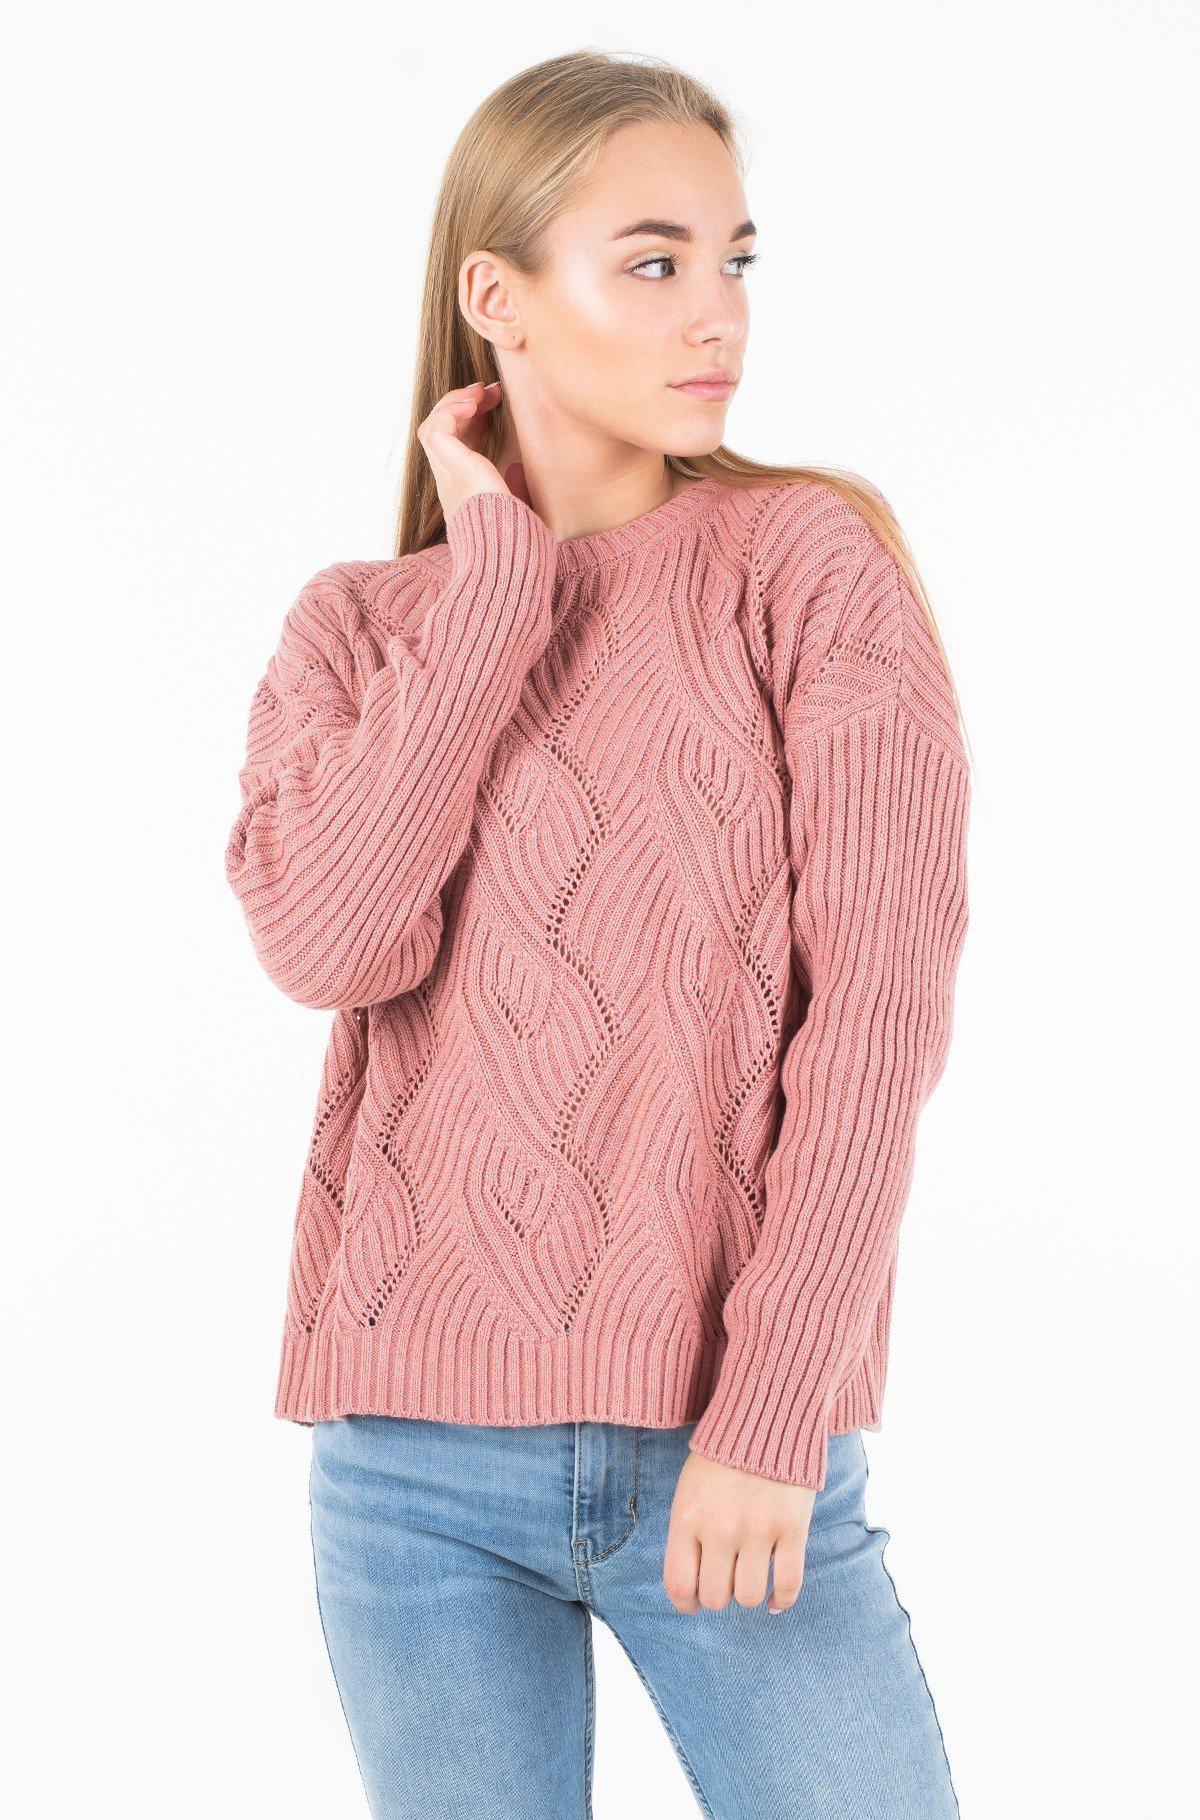 Sweater 1013550-full-1